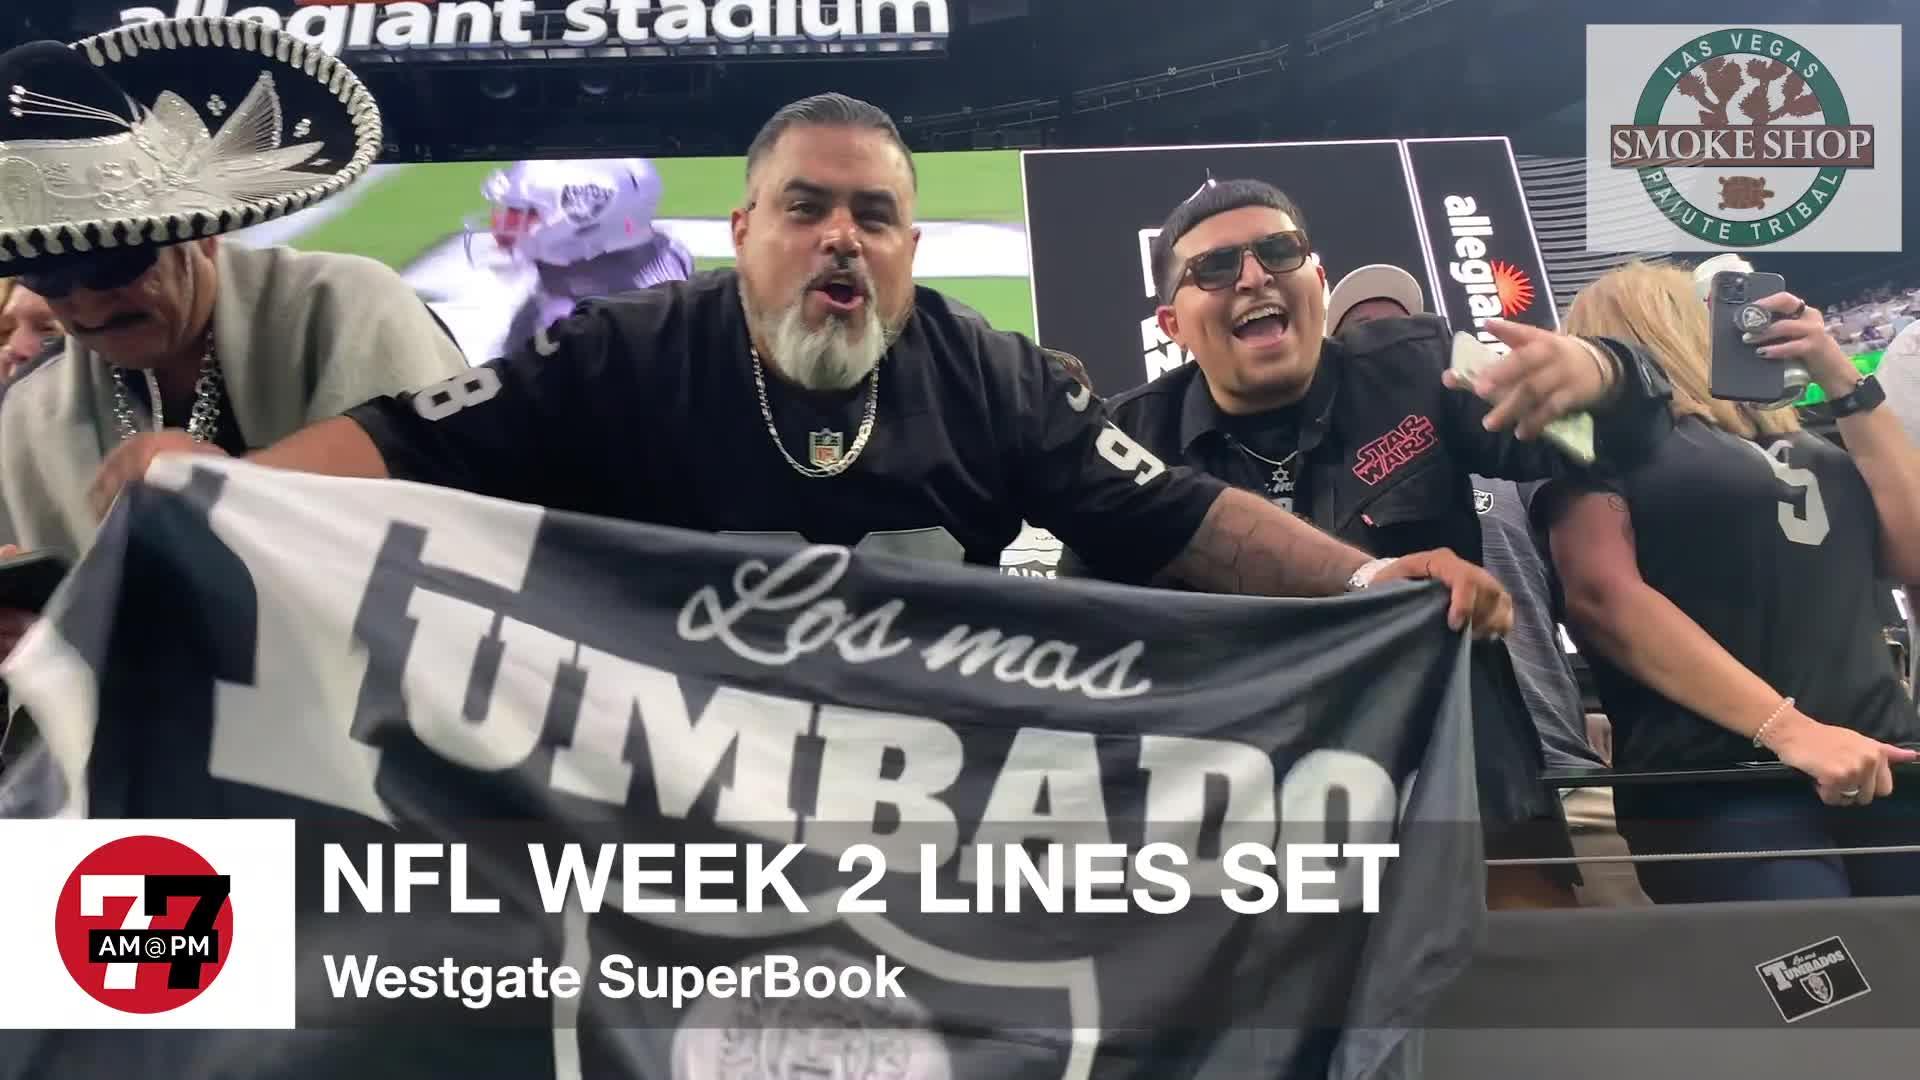 7@7PM NFL Week 2 Lines Set